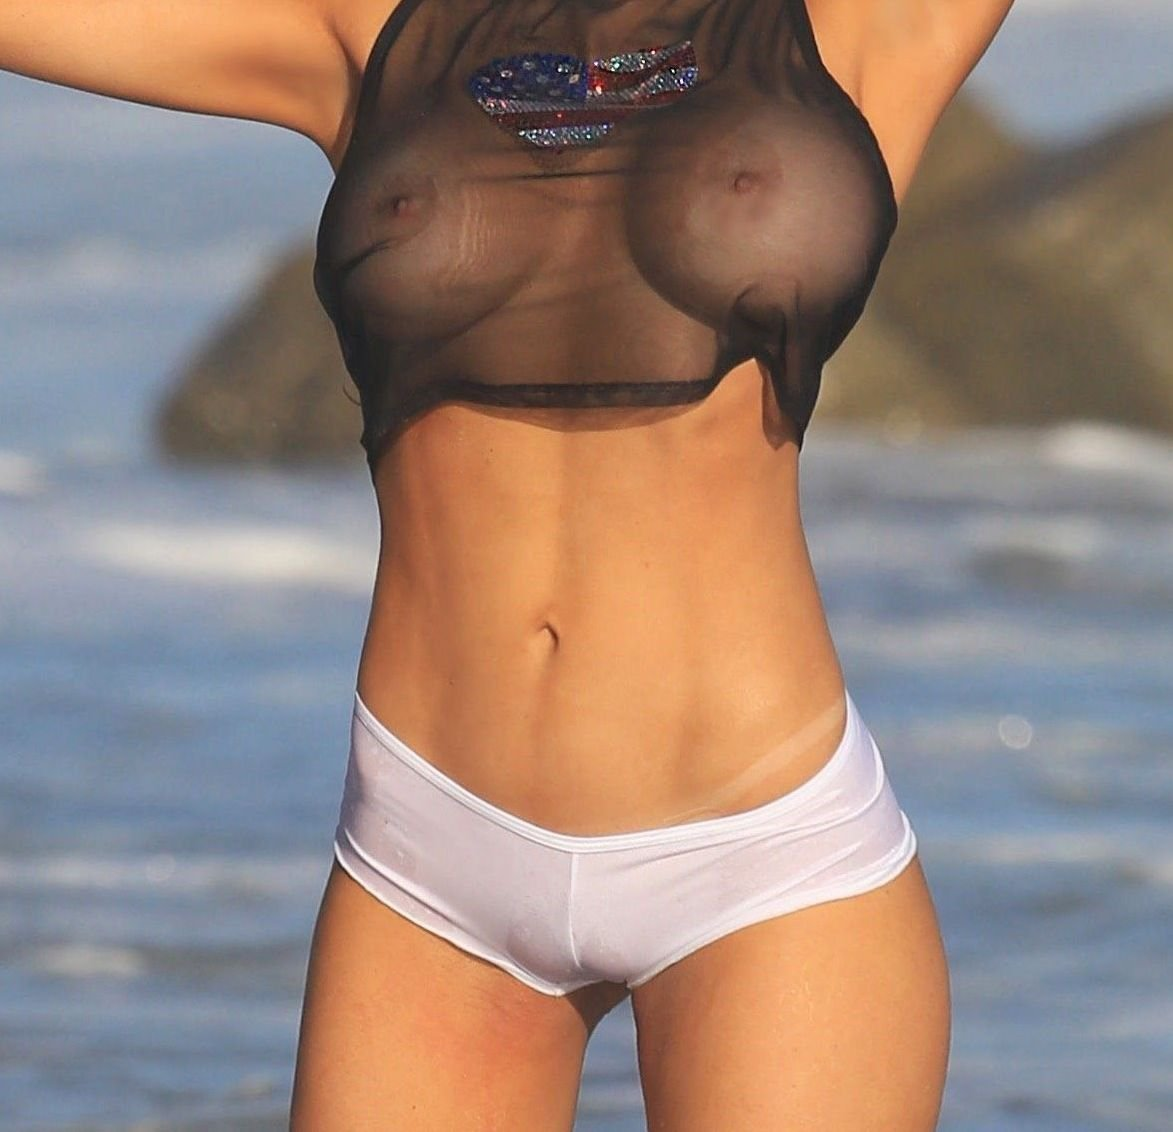 image Amanda seyfried nude sex scene in chloe scandalplanetcom